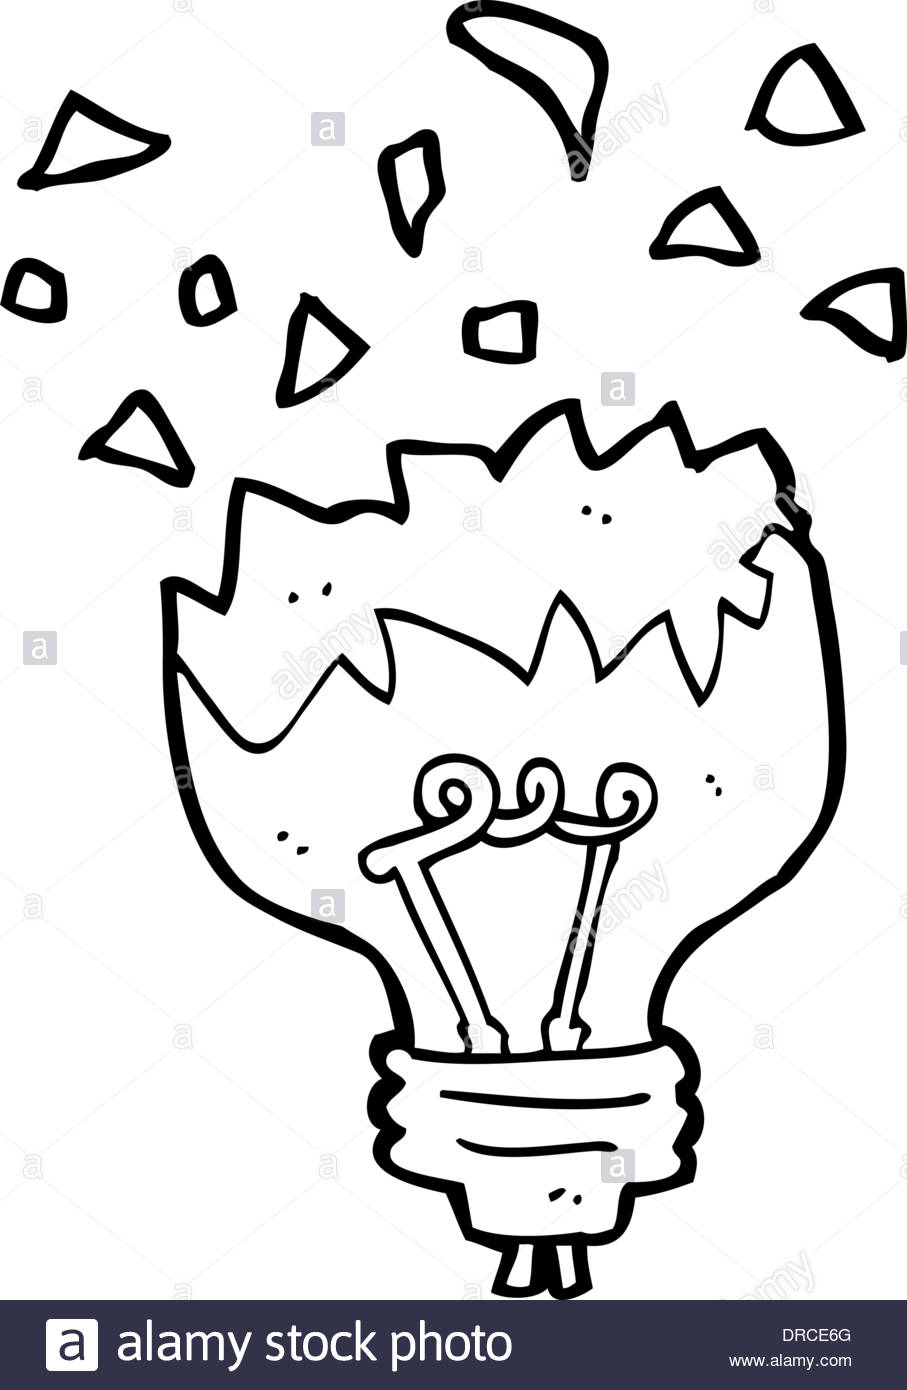 907x1390 Cartoon Light Bulb Exploding Stock Vector Art Amp Illustration